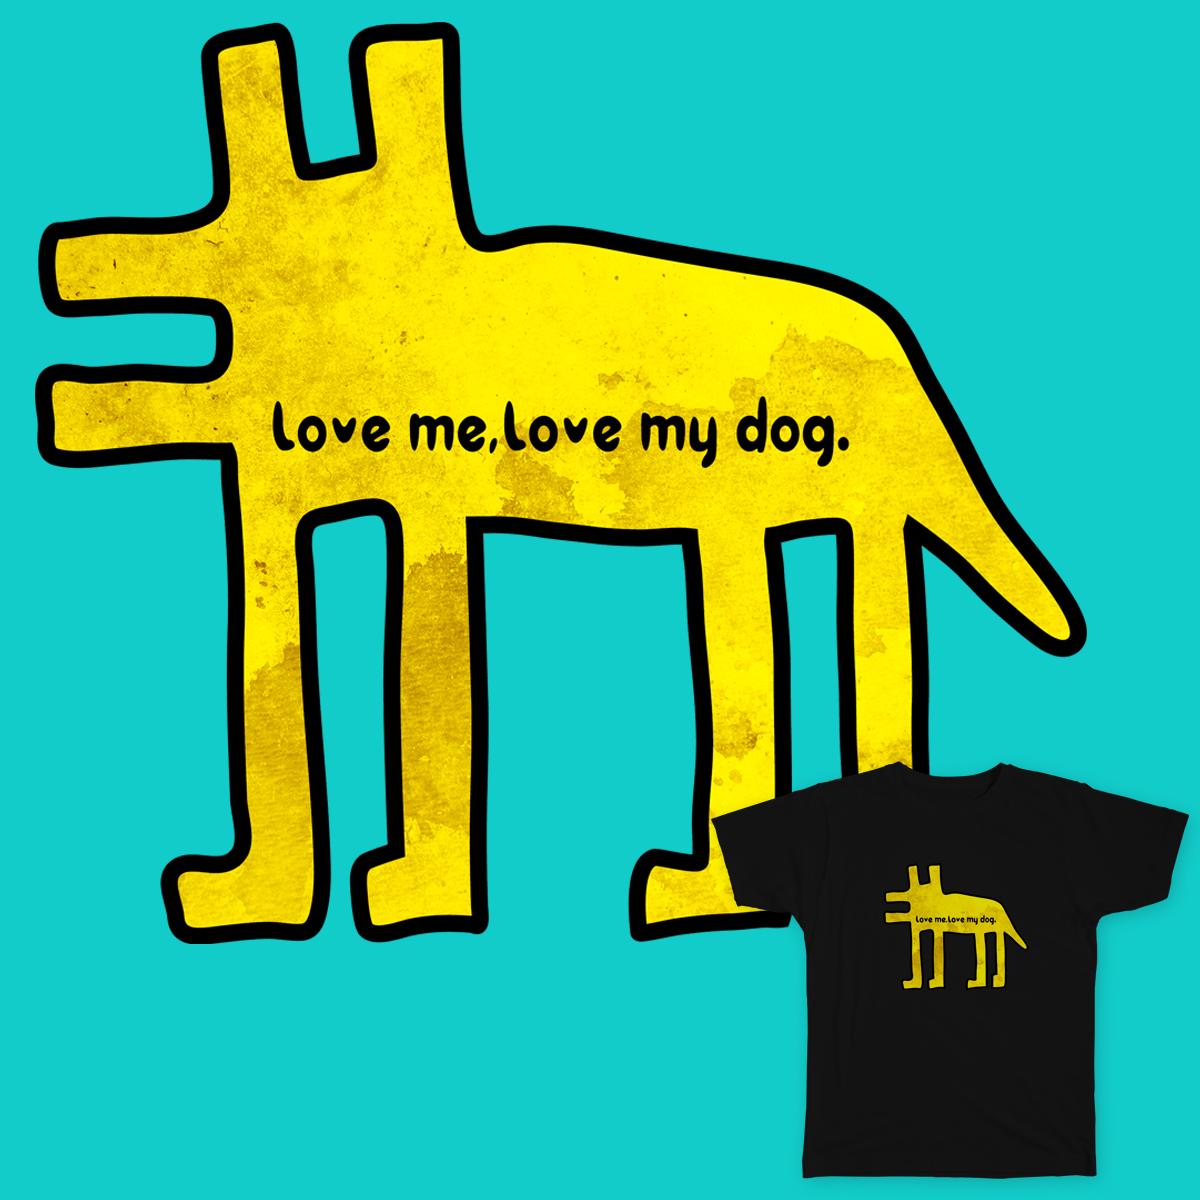 Love me,love my dog! by shigeki on Threadless